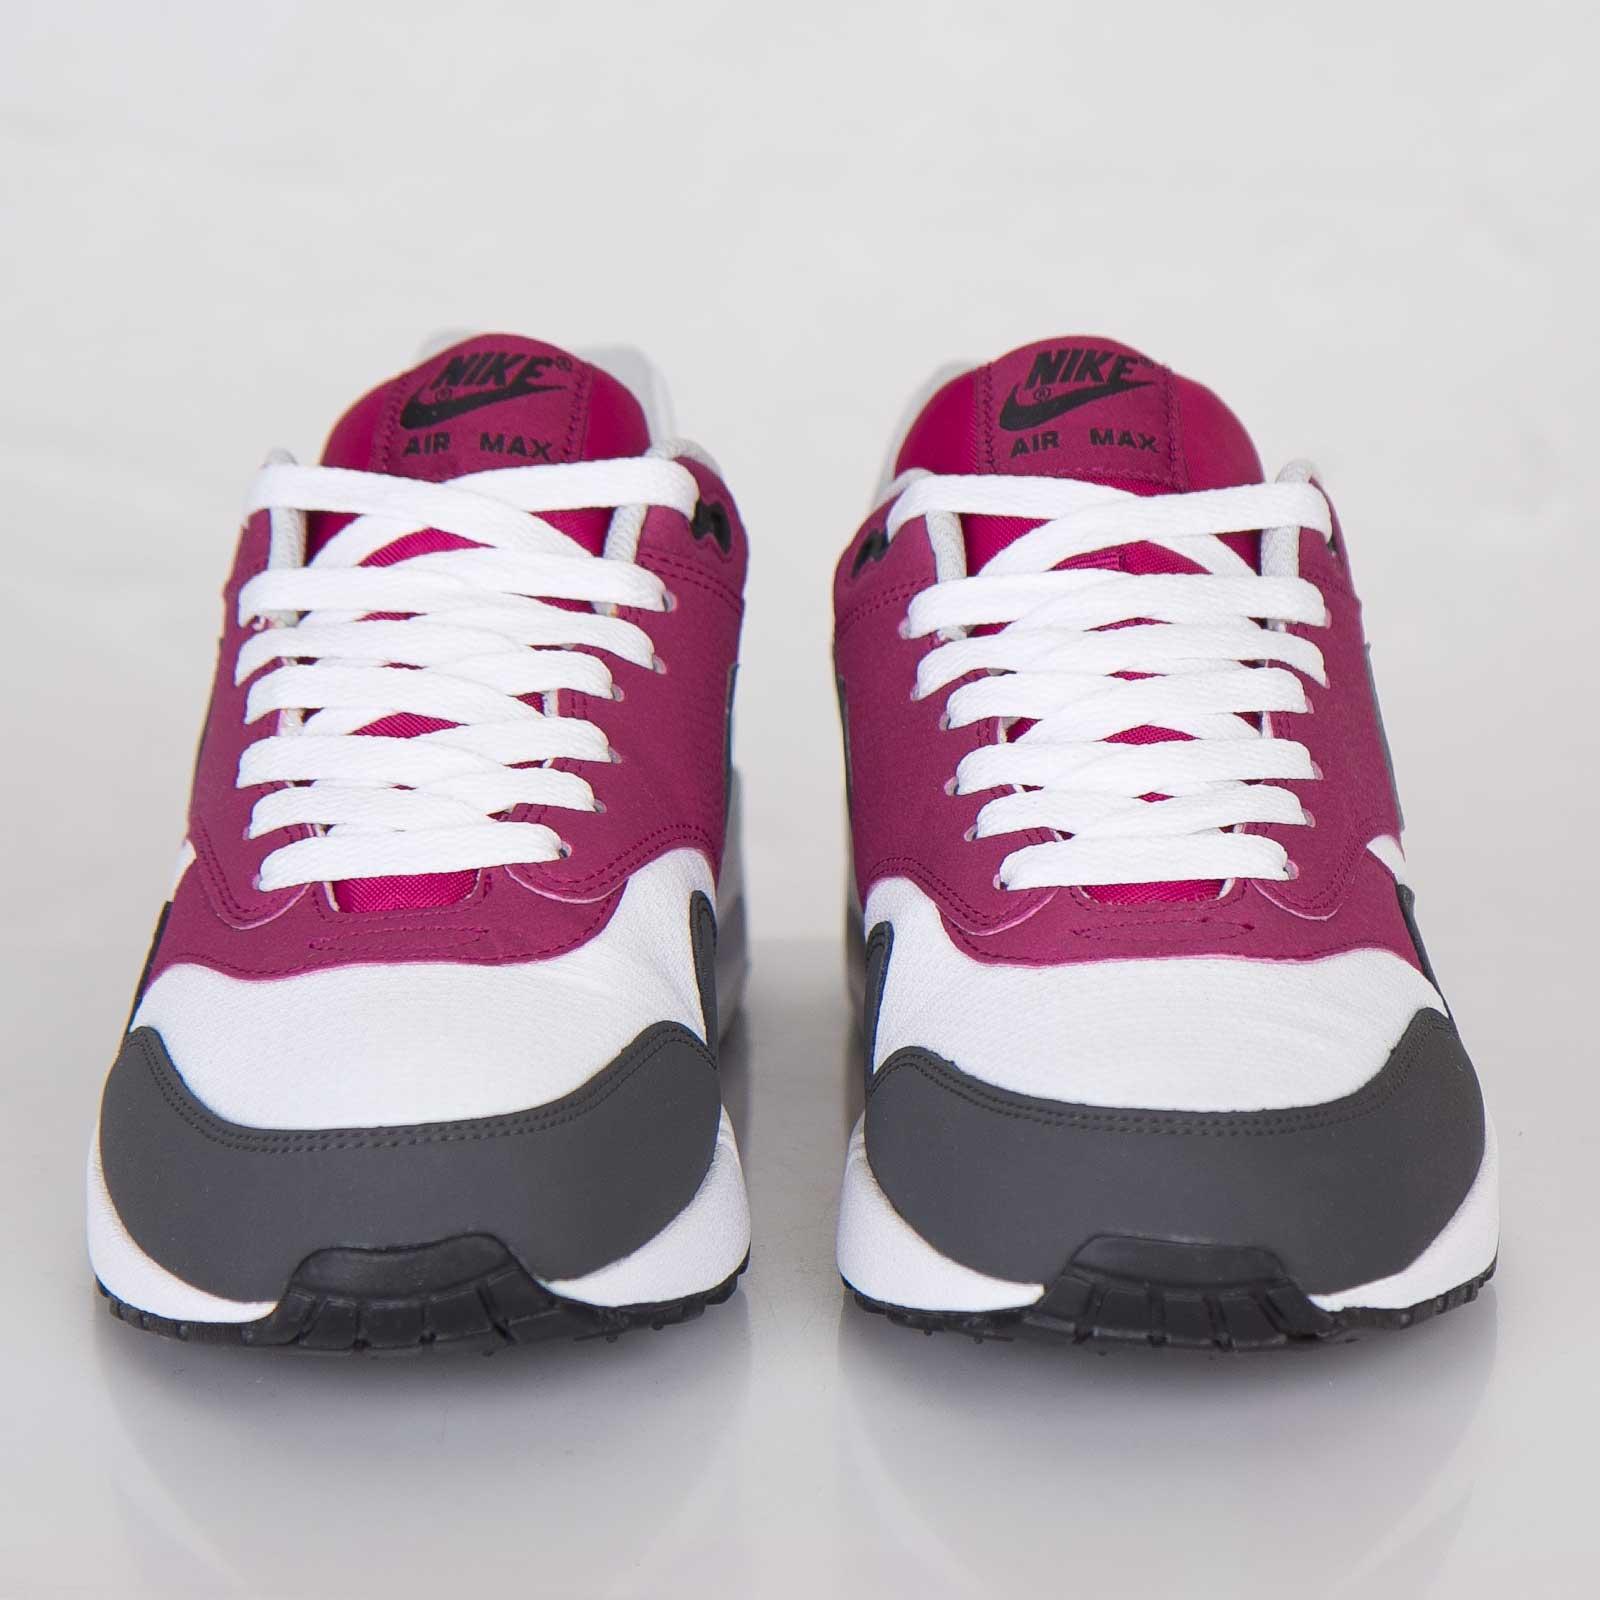 Nike Air Max 1 Essential White Dark Base Grey Bright Magenta